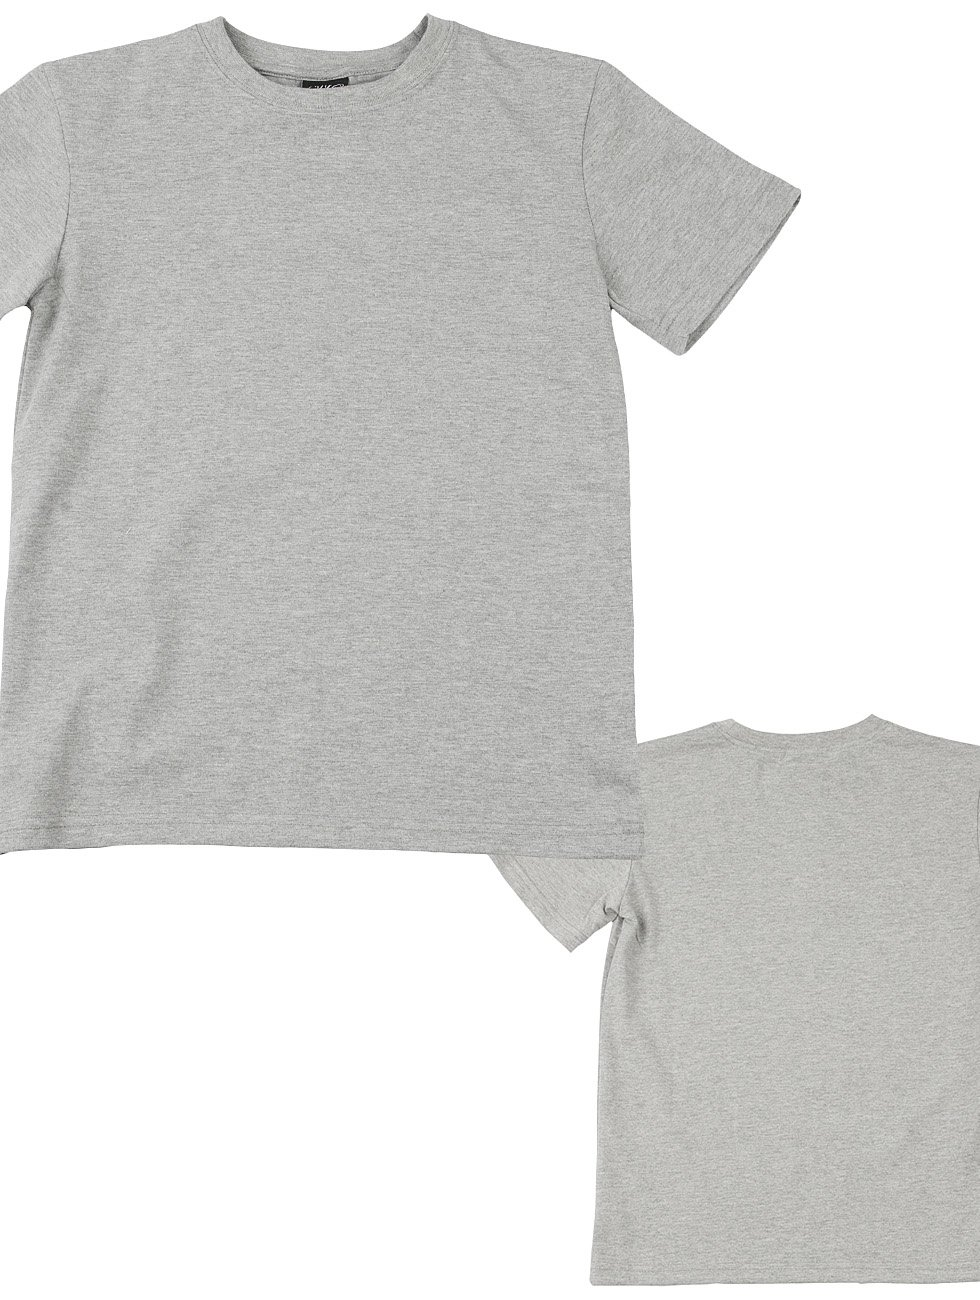 Urban Classics T-Shirt Kids Basic grau